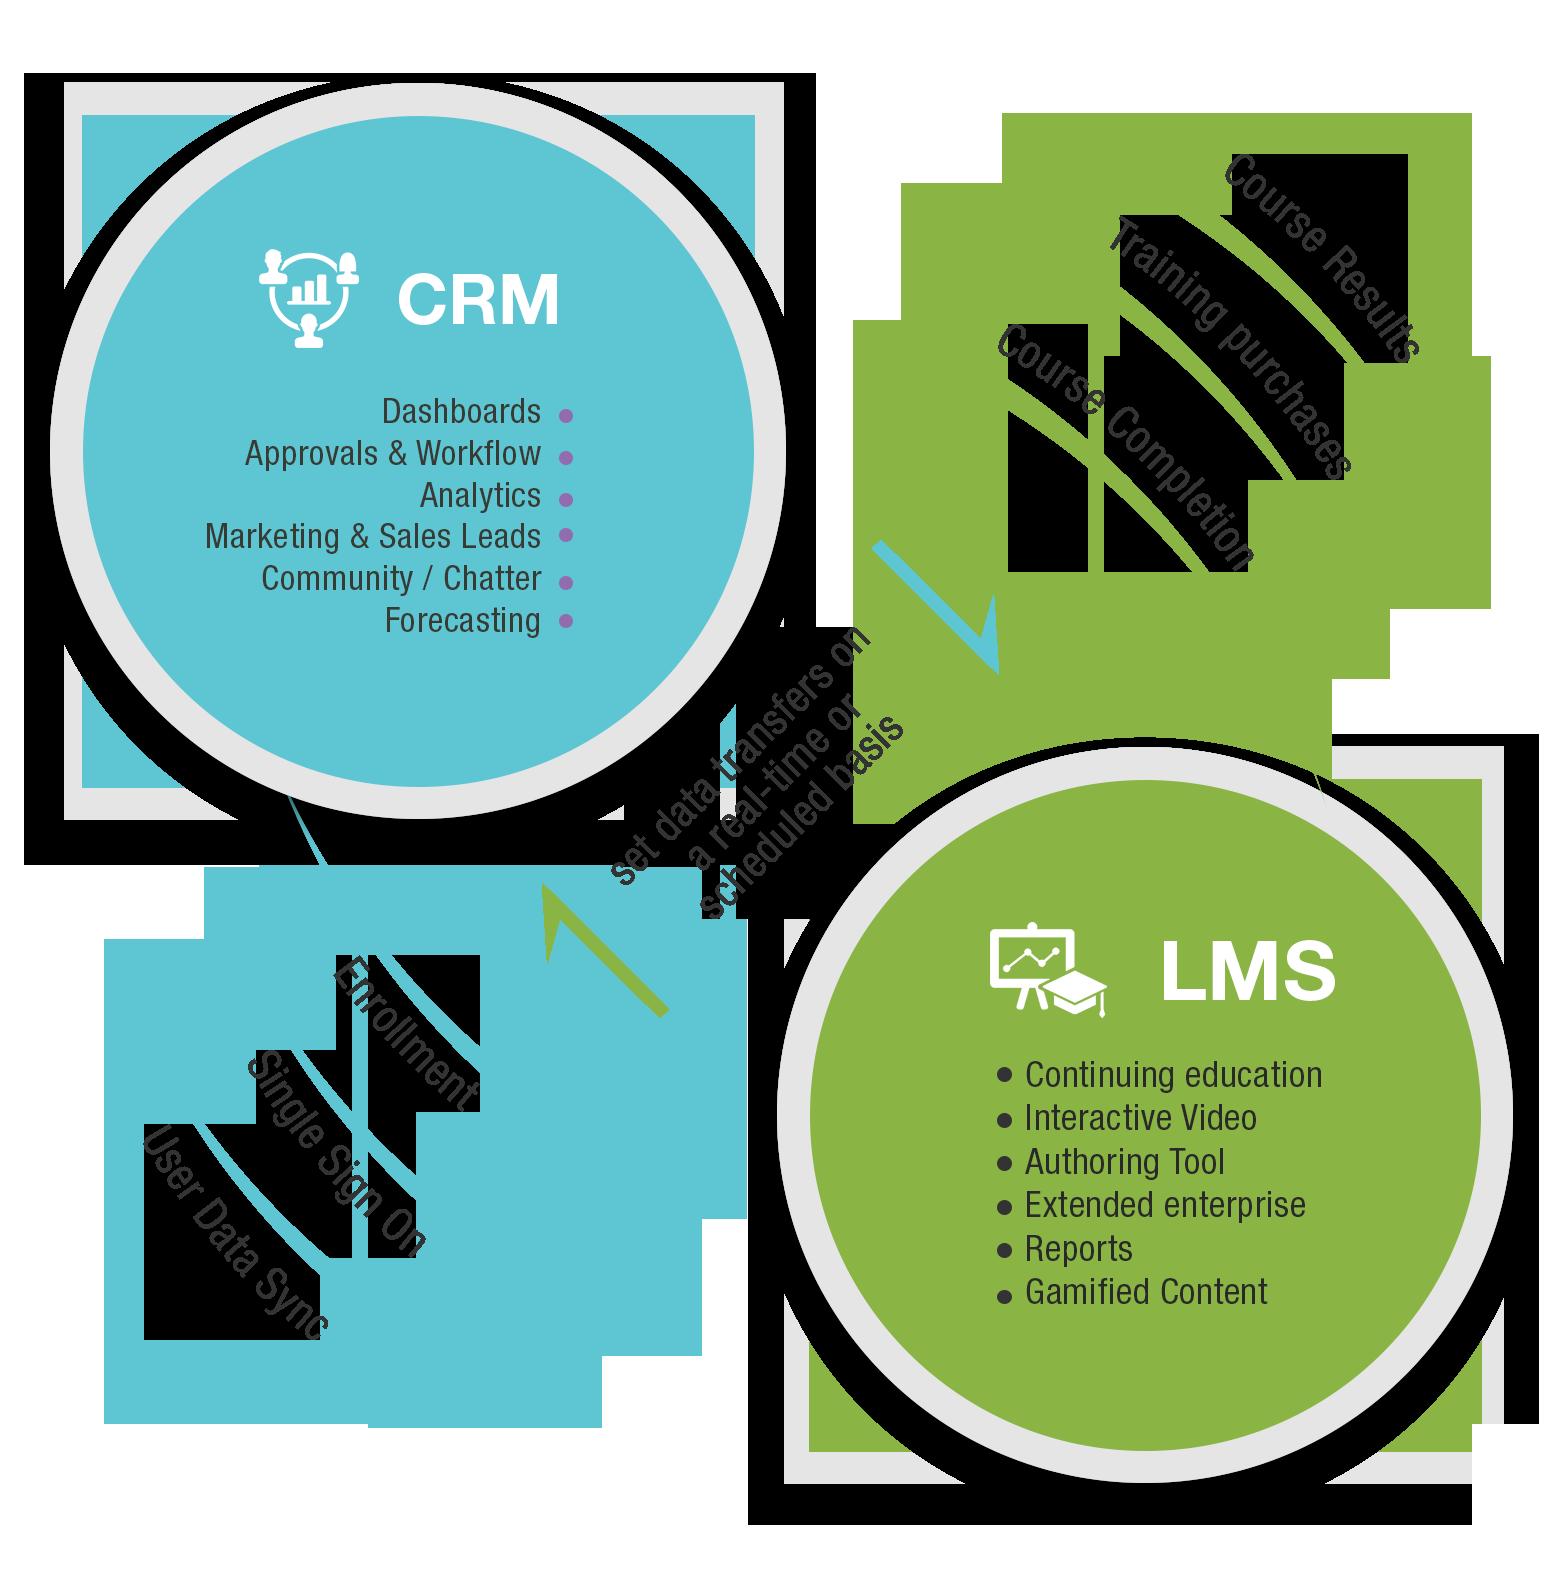 CRM LMS 2